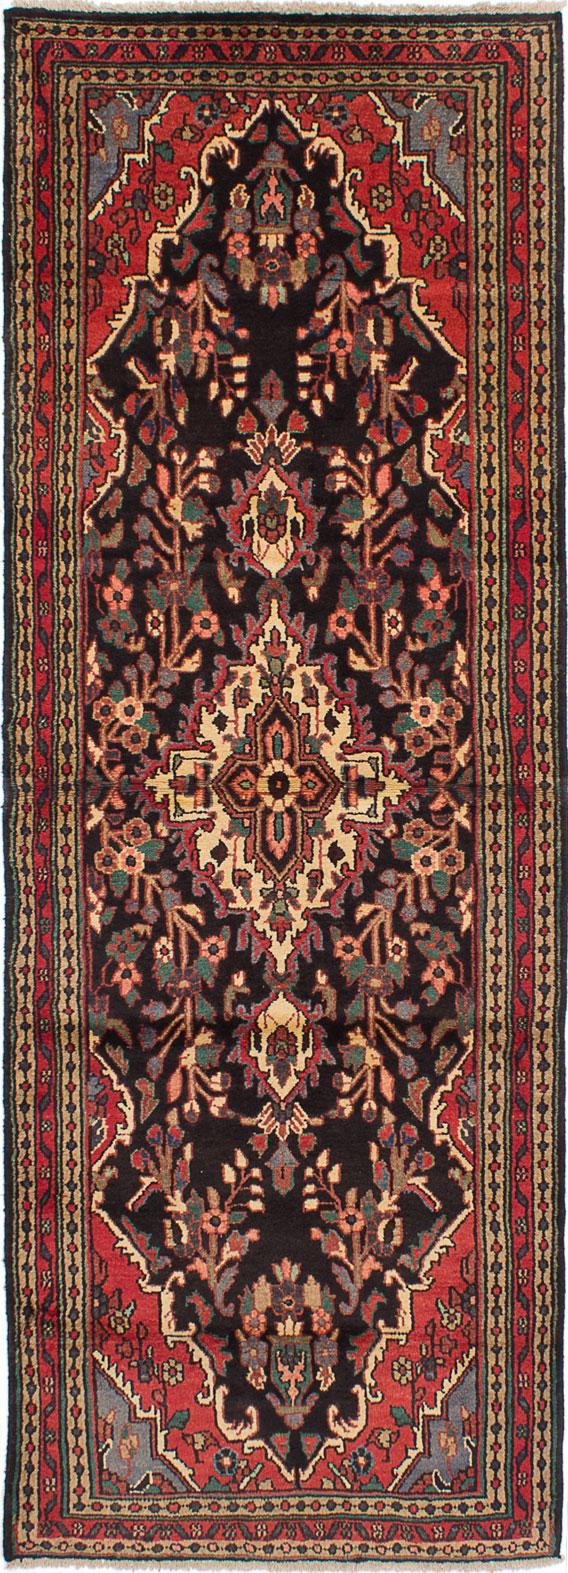 "Hand-knotted Hamadan Black, Dark Blue, Red Wool Rug 3'7"" x 9'10"" Size: 3'7"" x 9'10"""